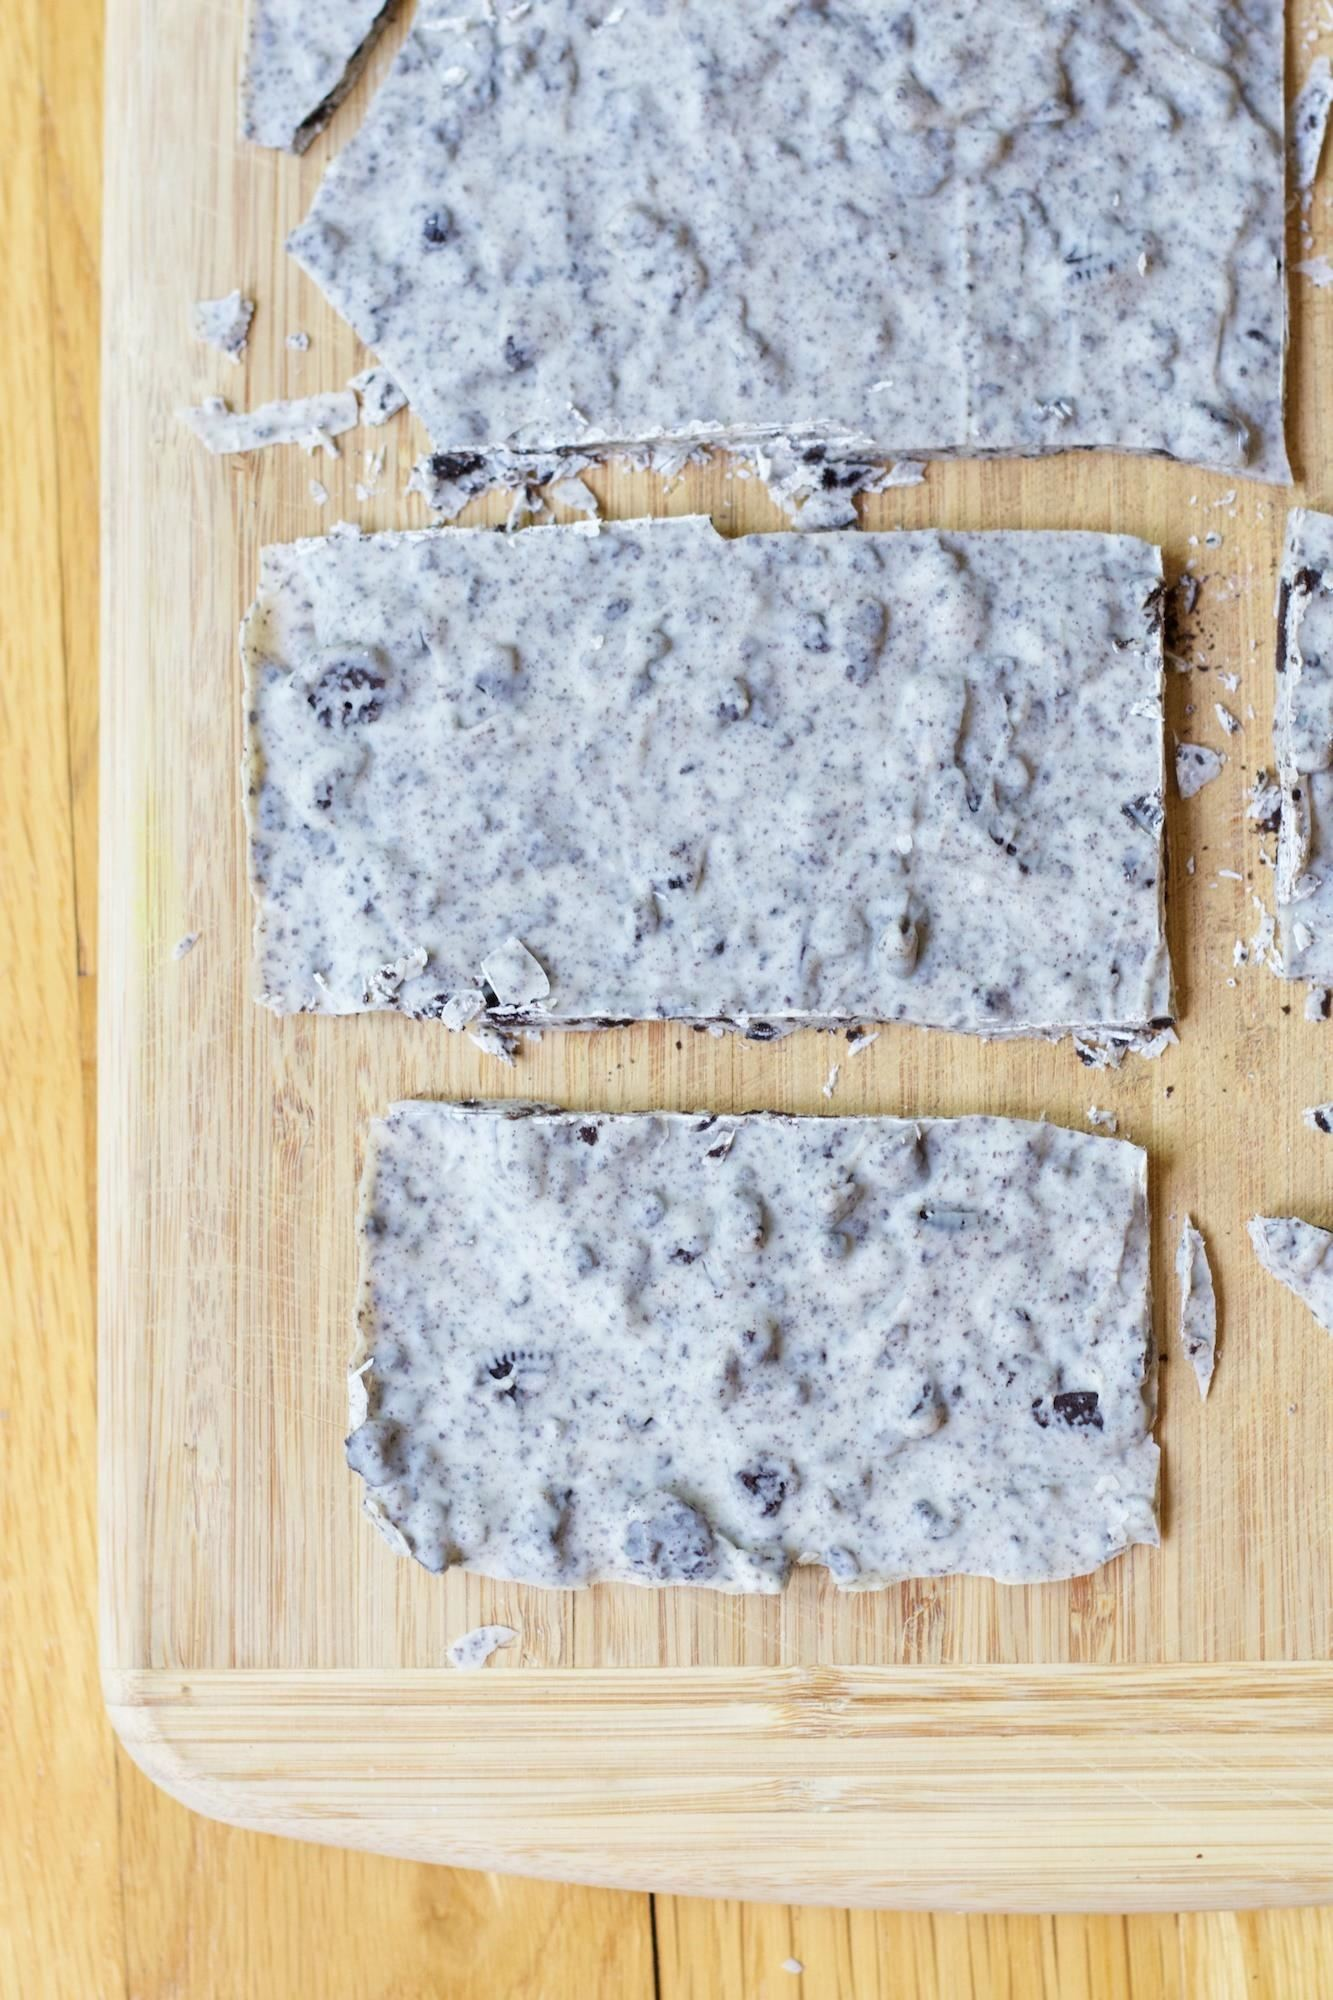 How to Make Hershey's Cookies 'n' Creme Bars